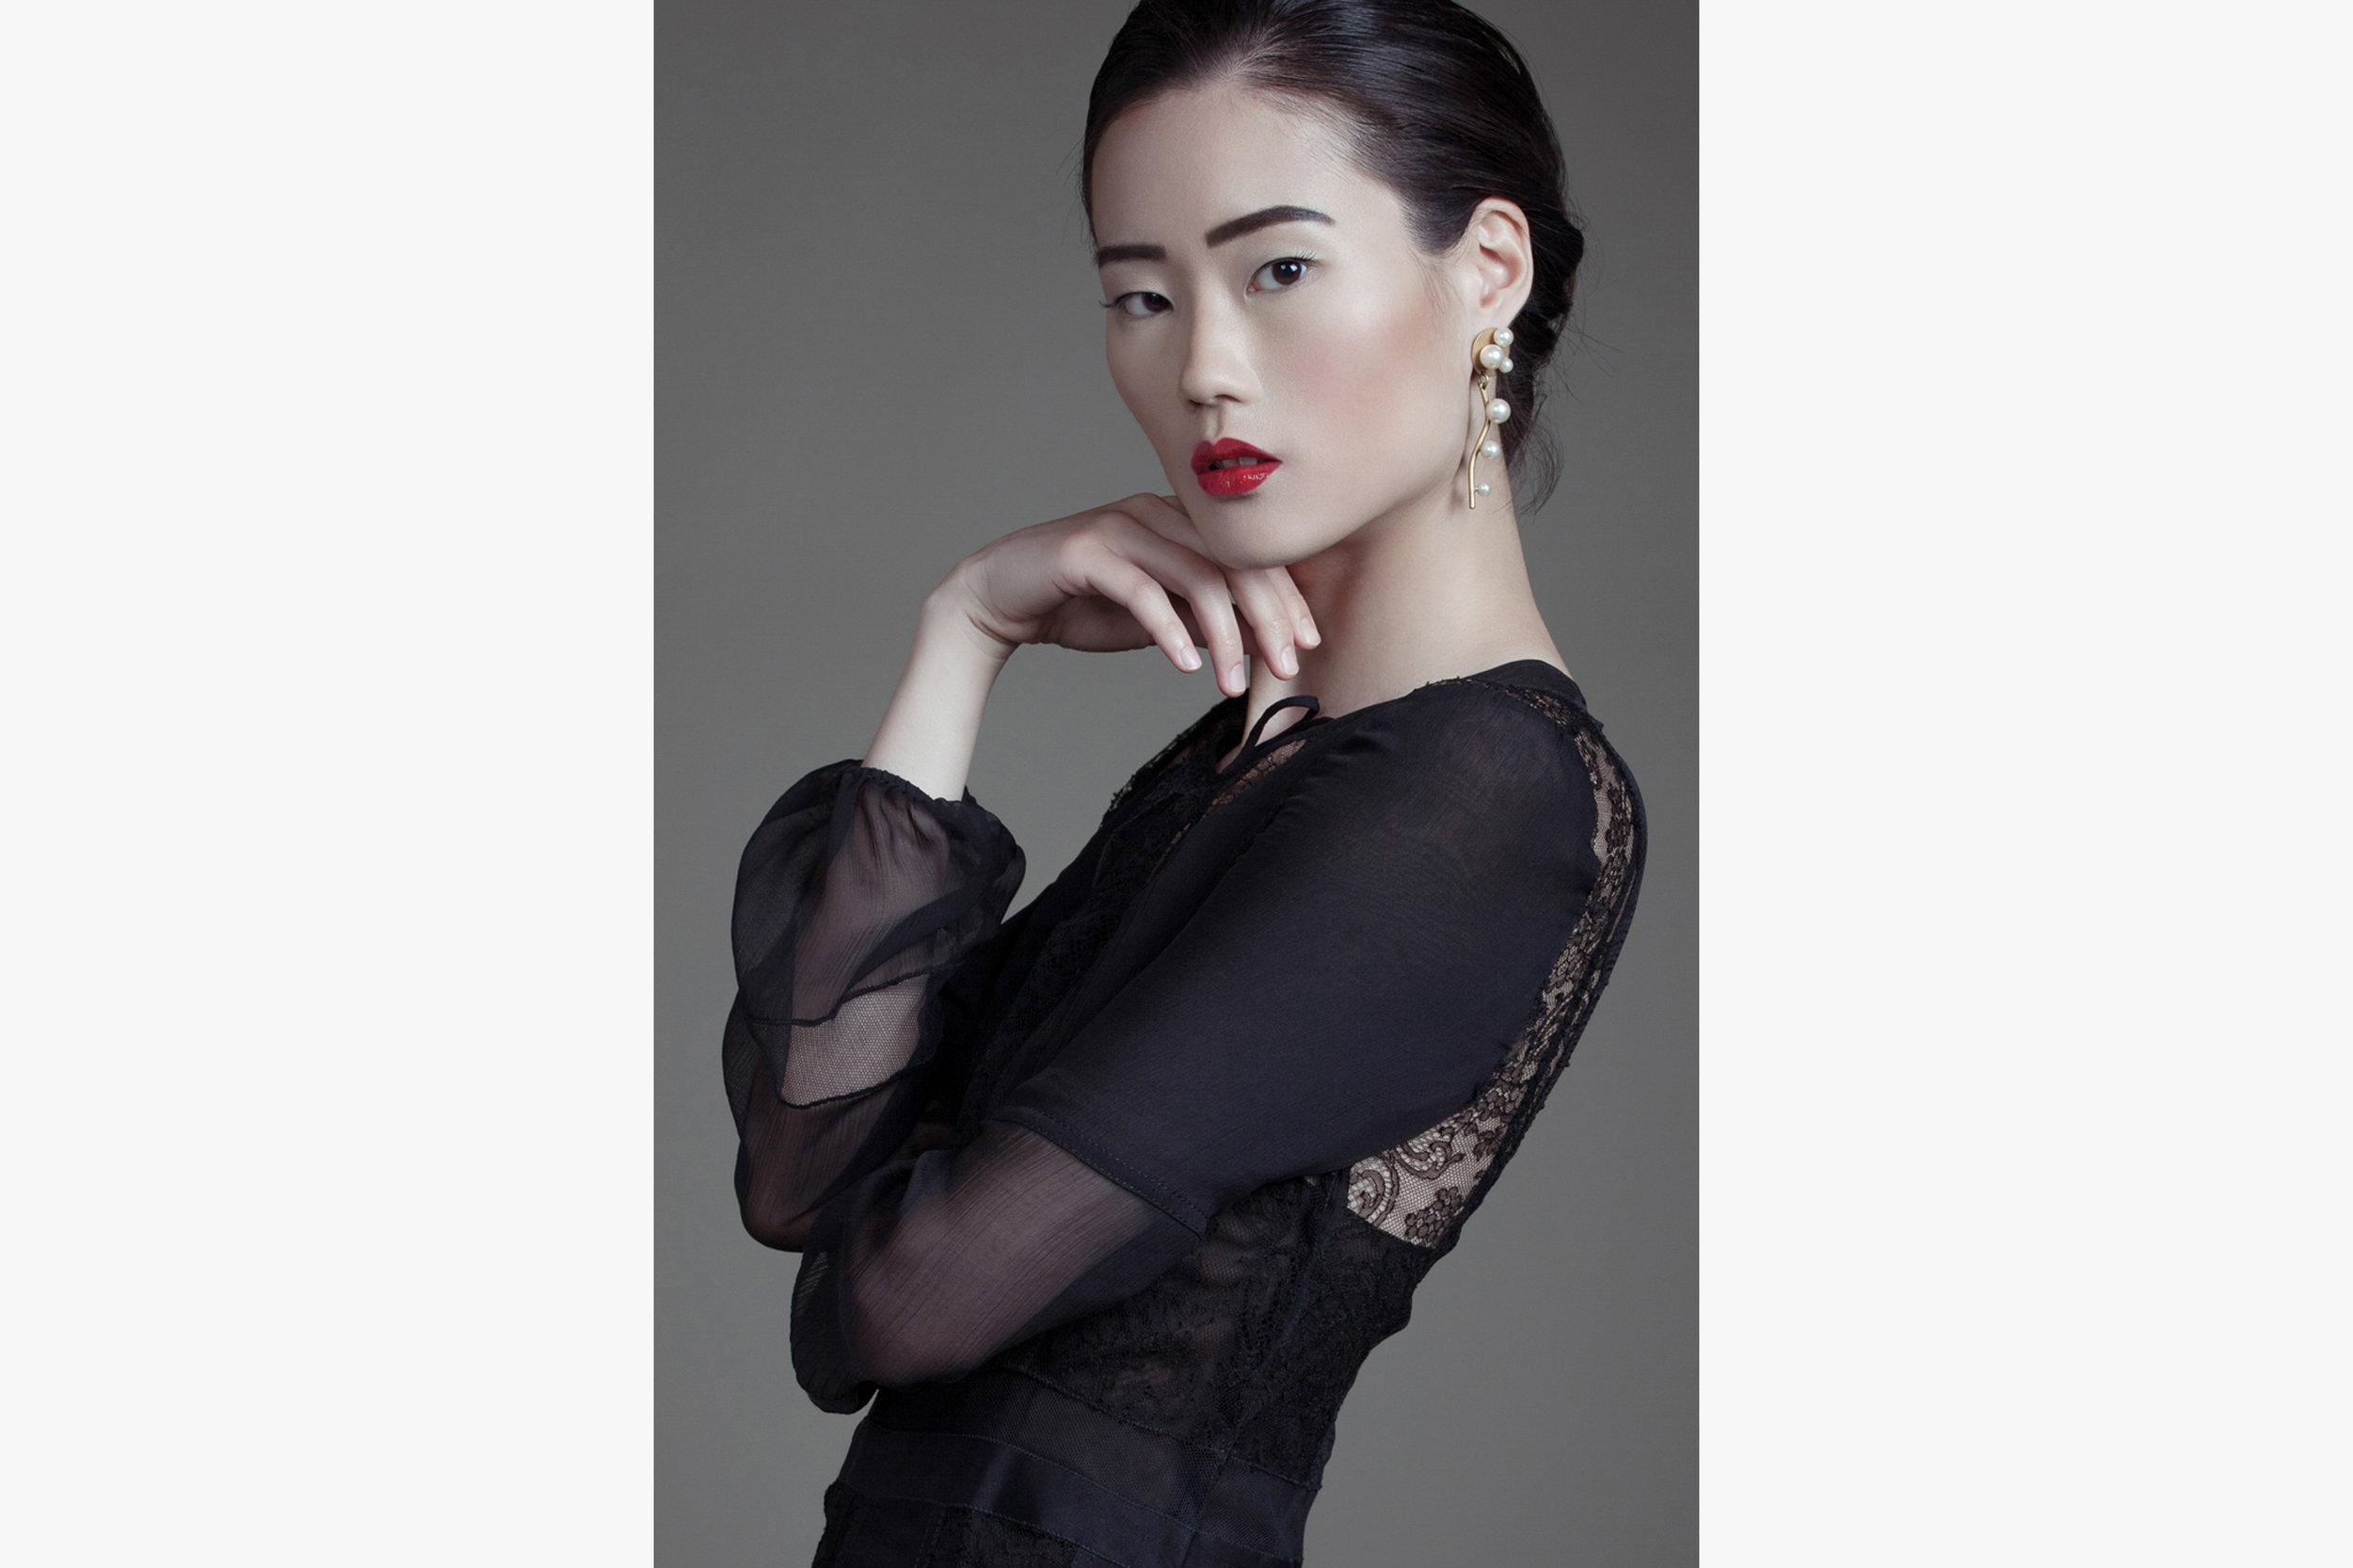 fashion-styling-by-geraldine-duskin-1.jpg